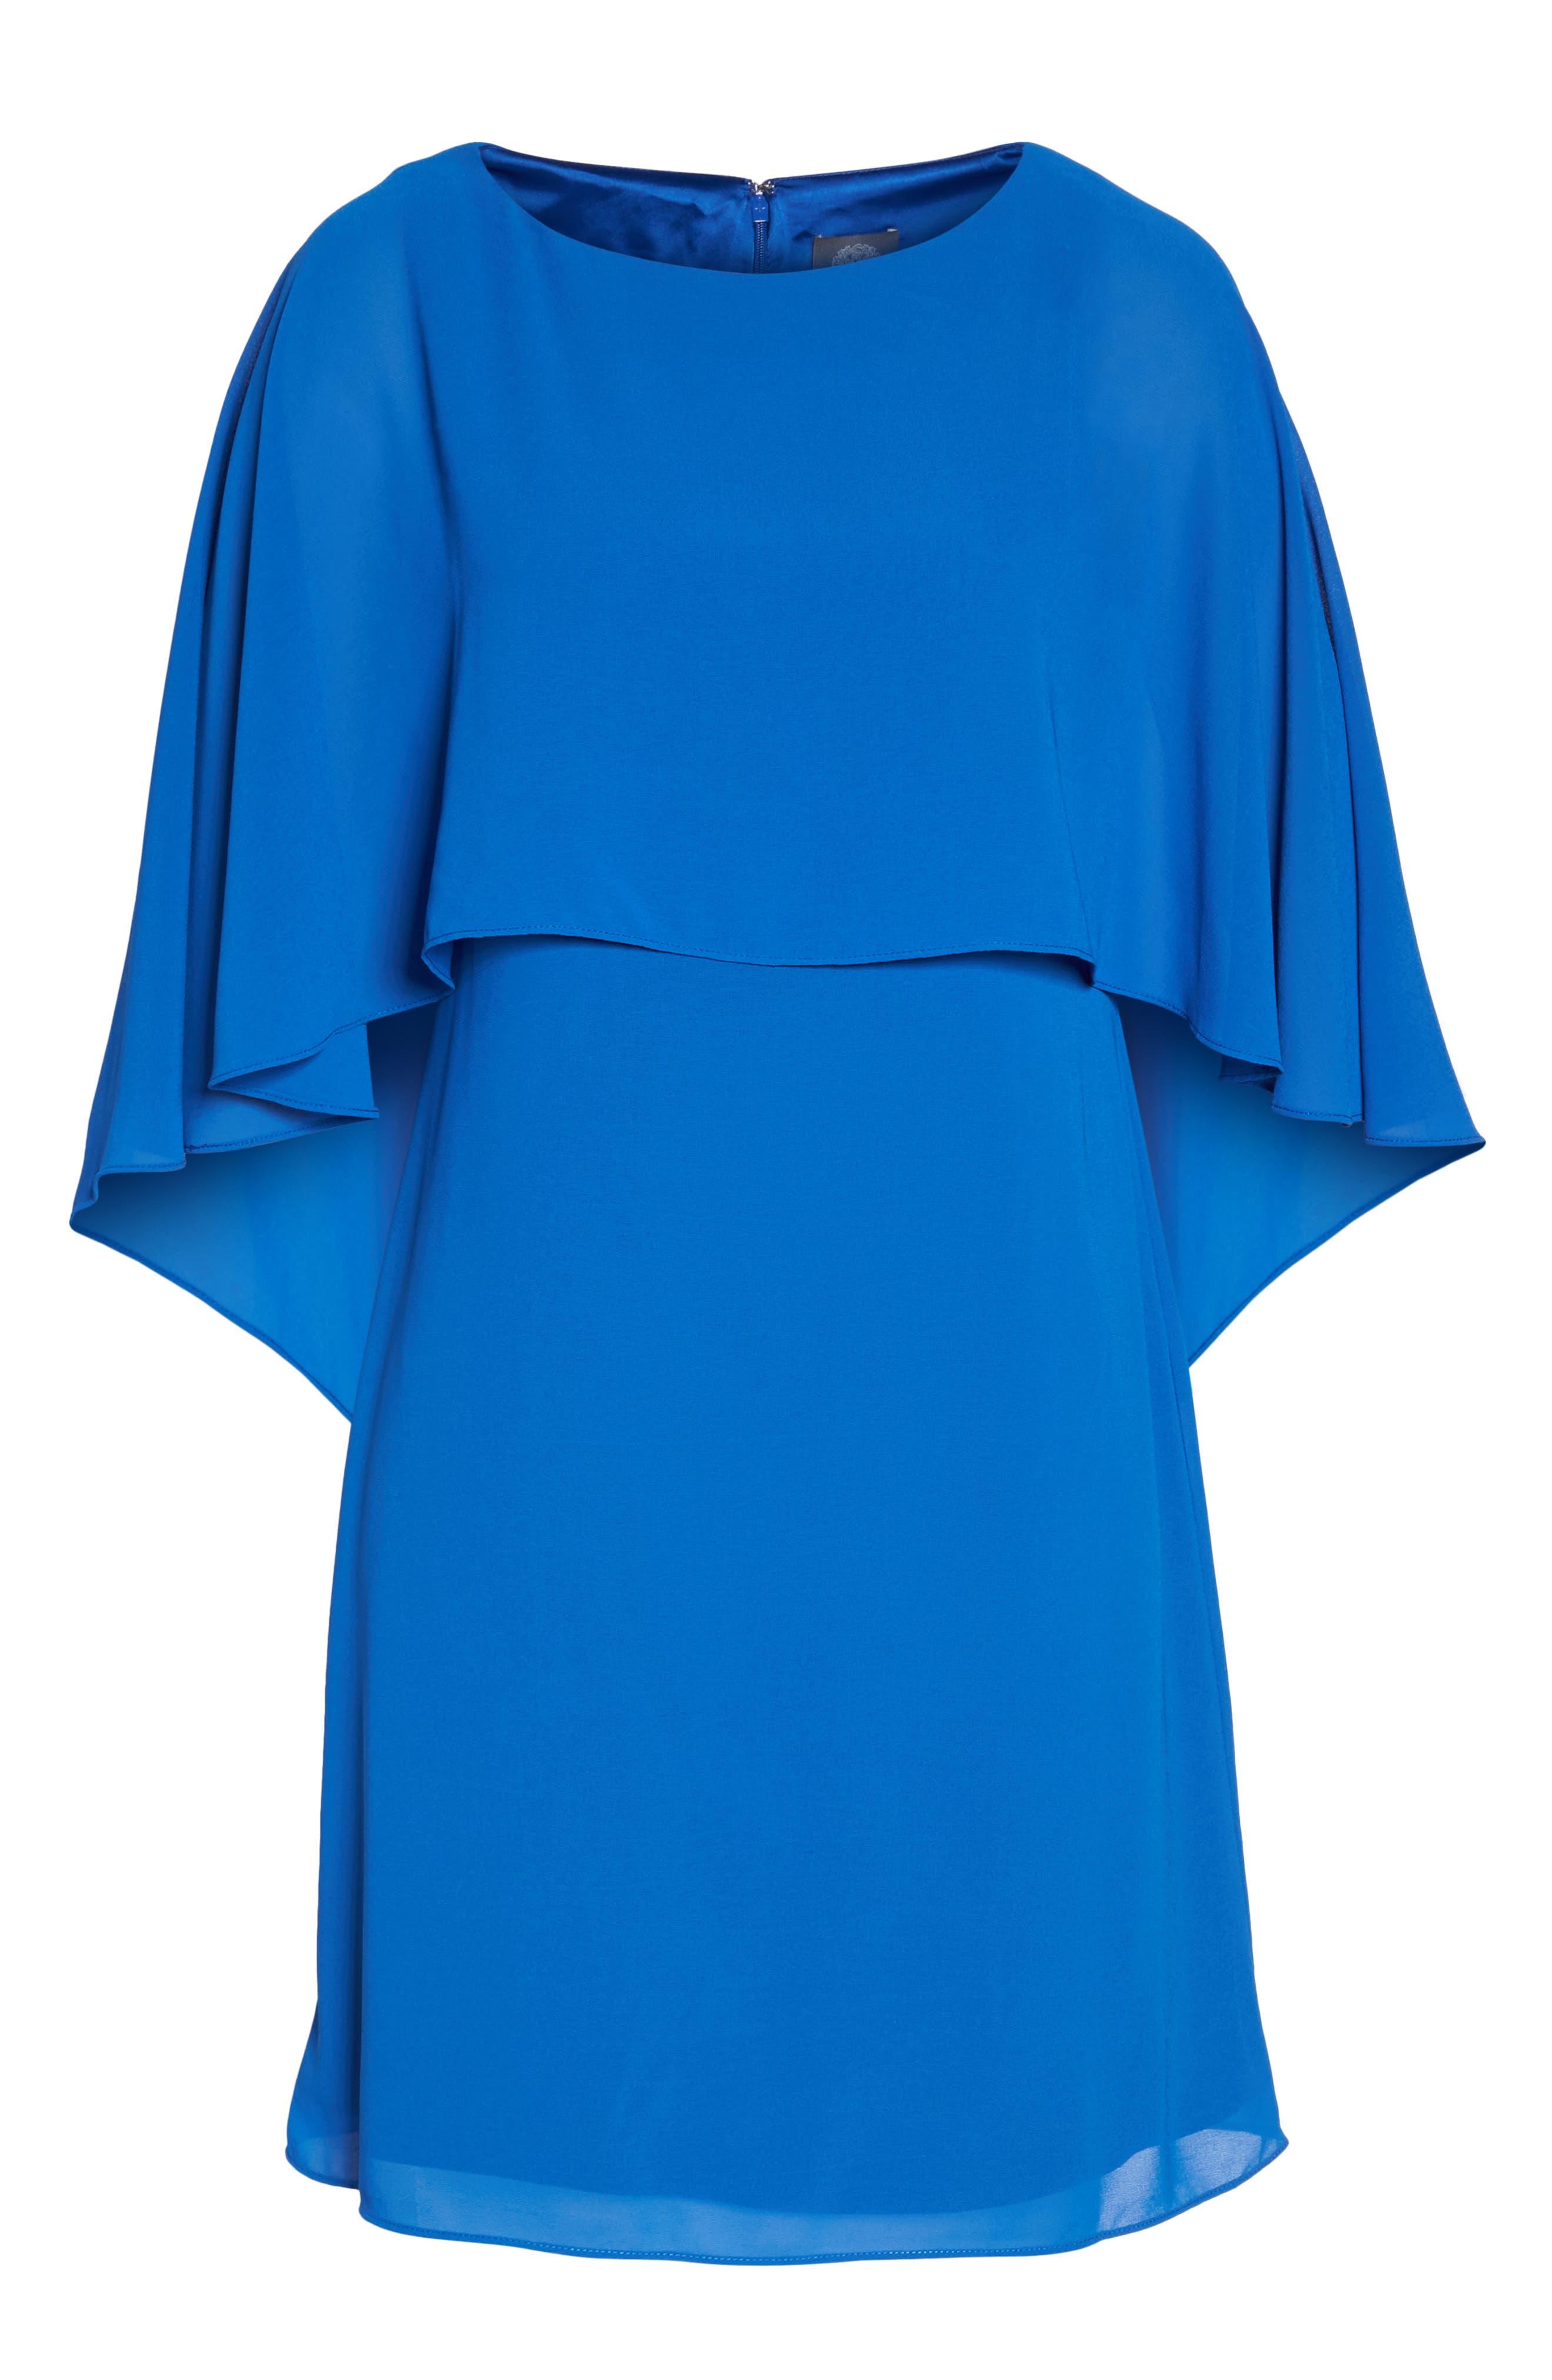 Cape Overlay Dress,                             Alternate thumbnail 7, color,                             ROYAL